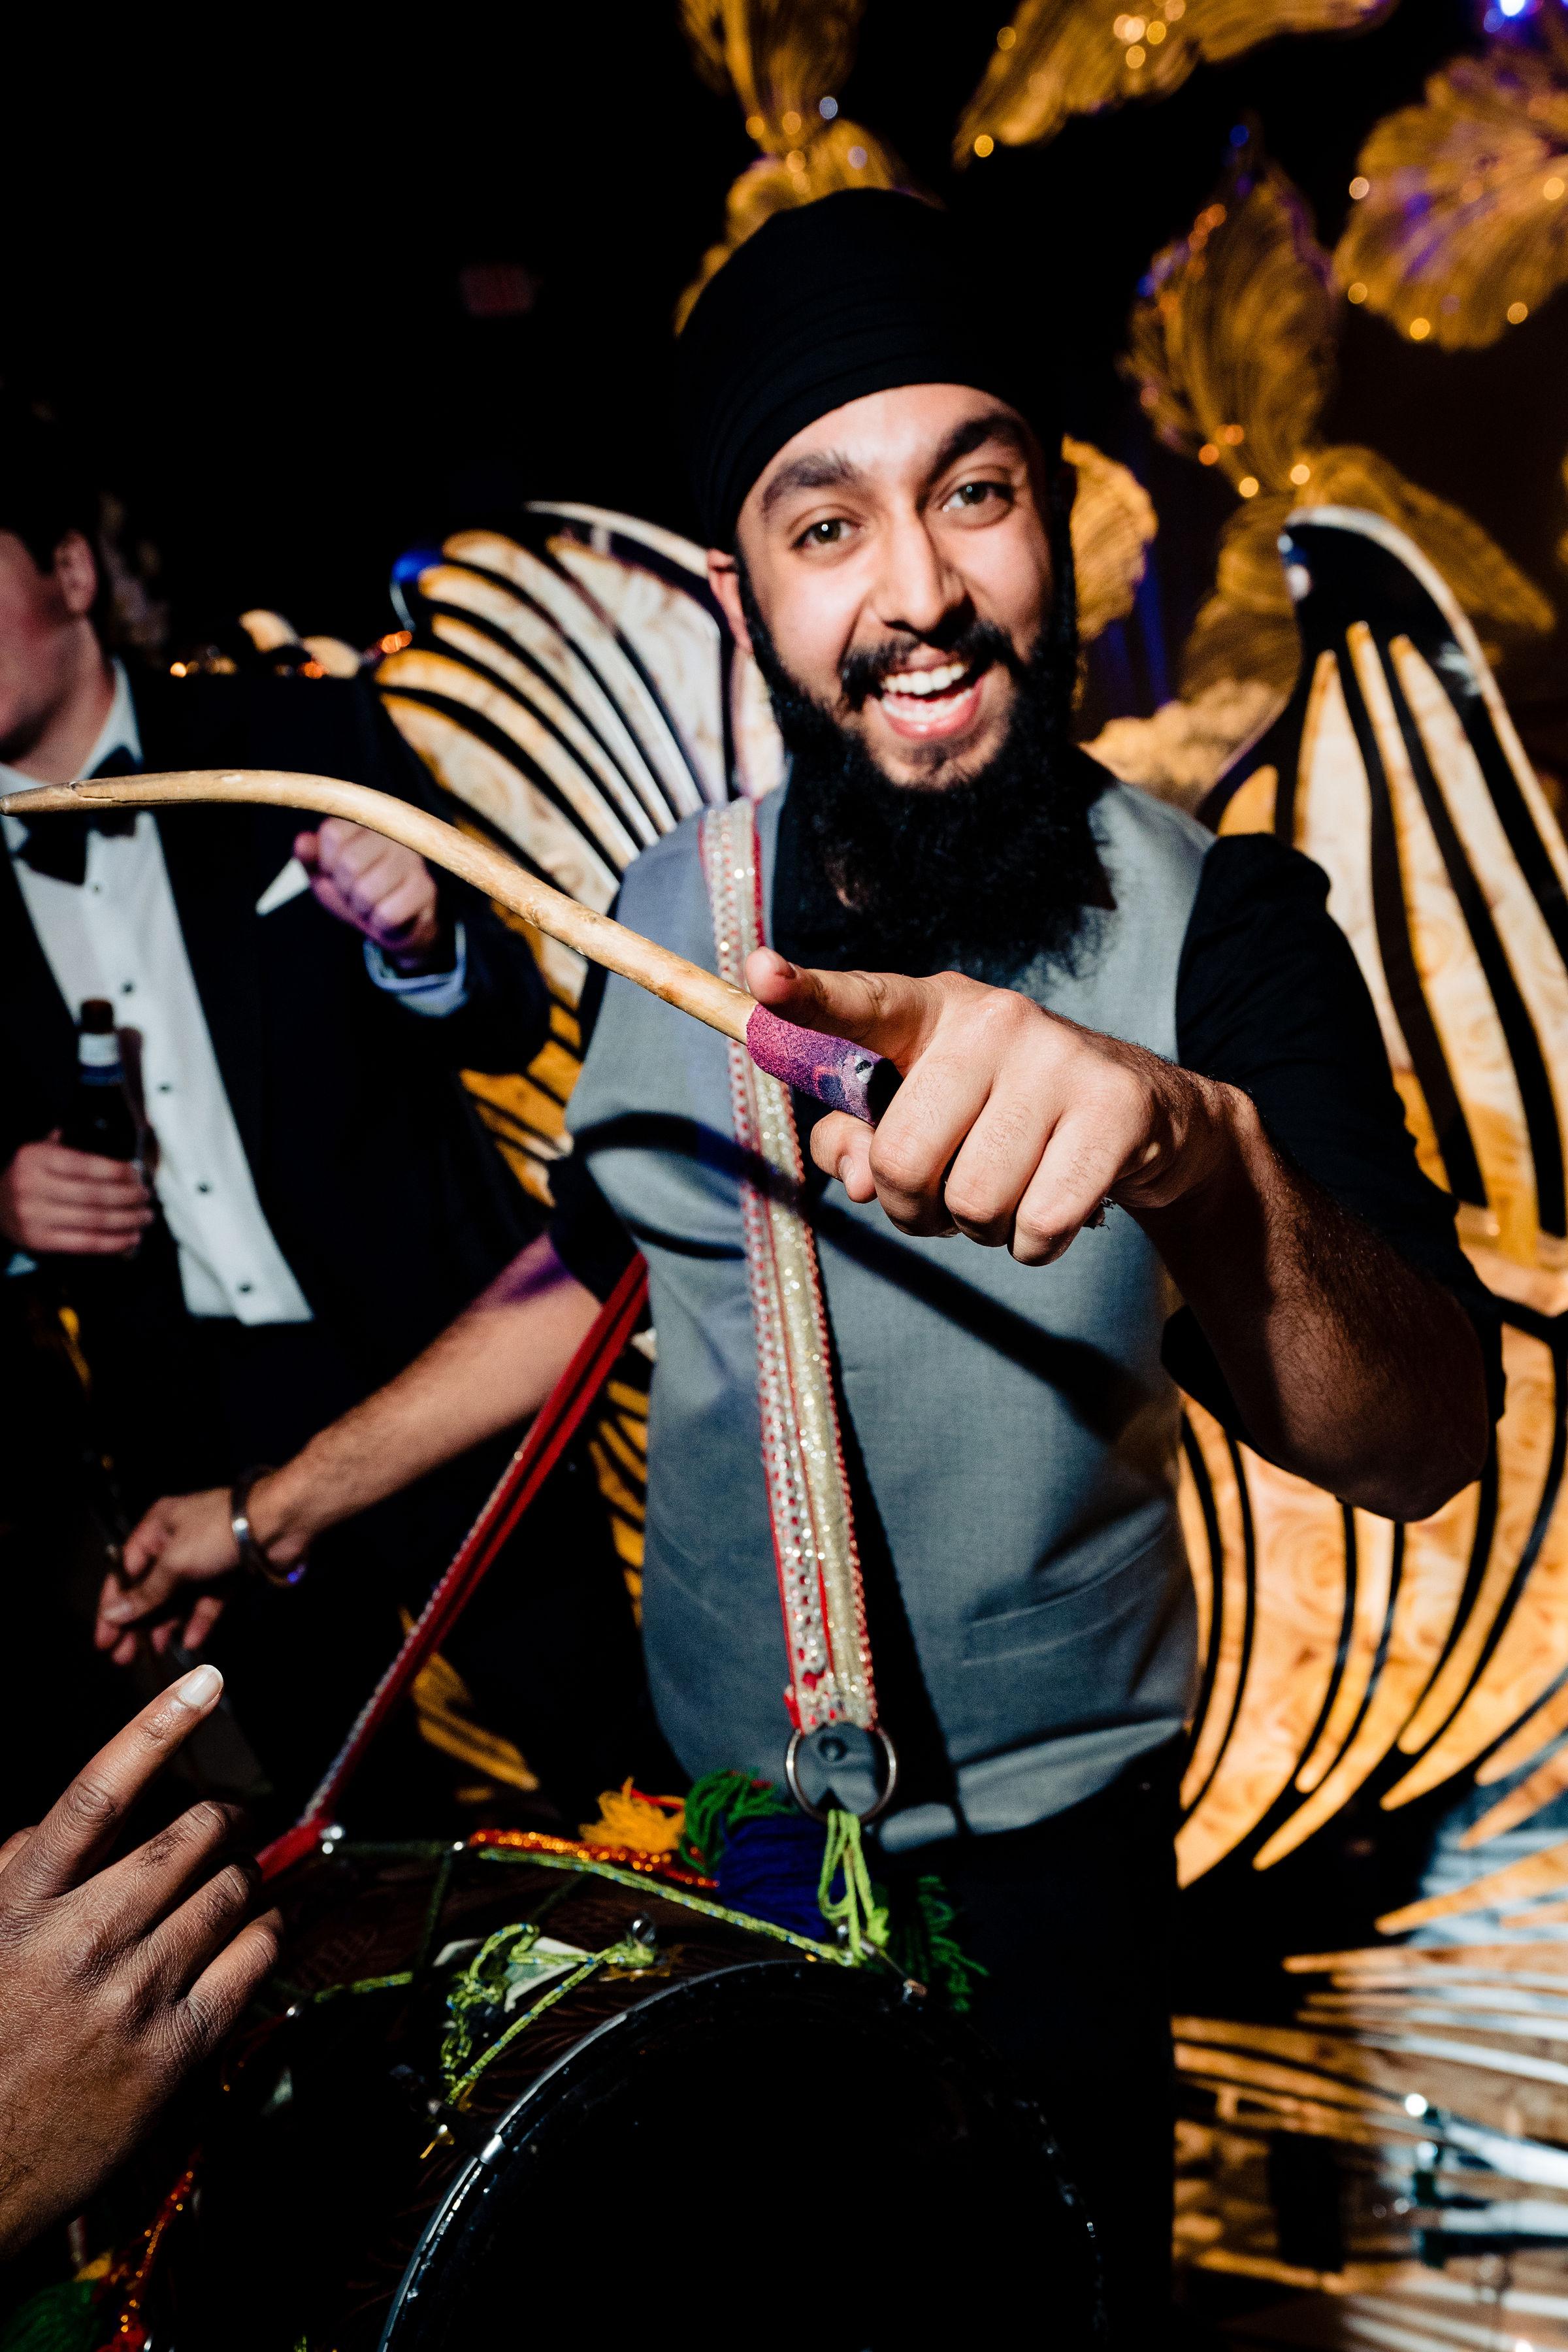 INDIAN WEDDING DOHL PLAYER.JPG